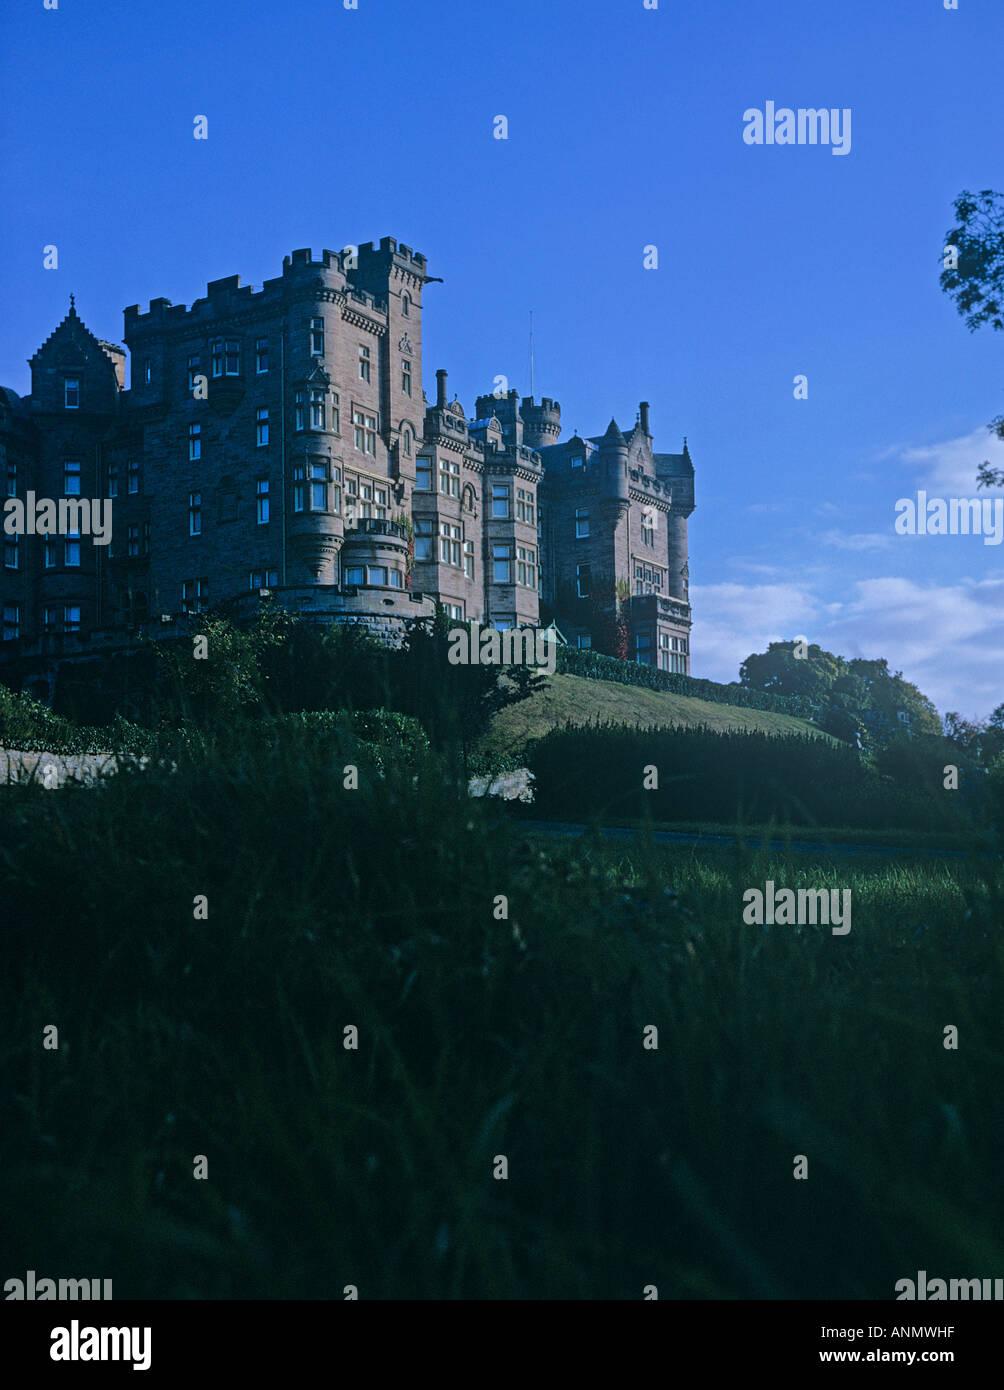 Skibo Castle haunted by a murdered woman whos screams are still heard near Dornoch on the East coast of Scotland - Stock Image